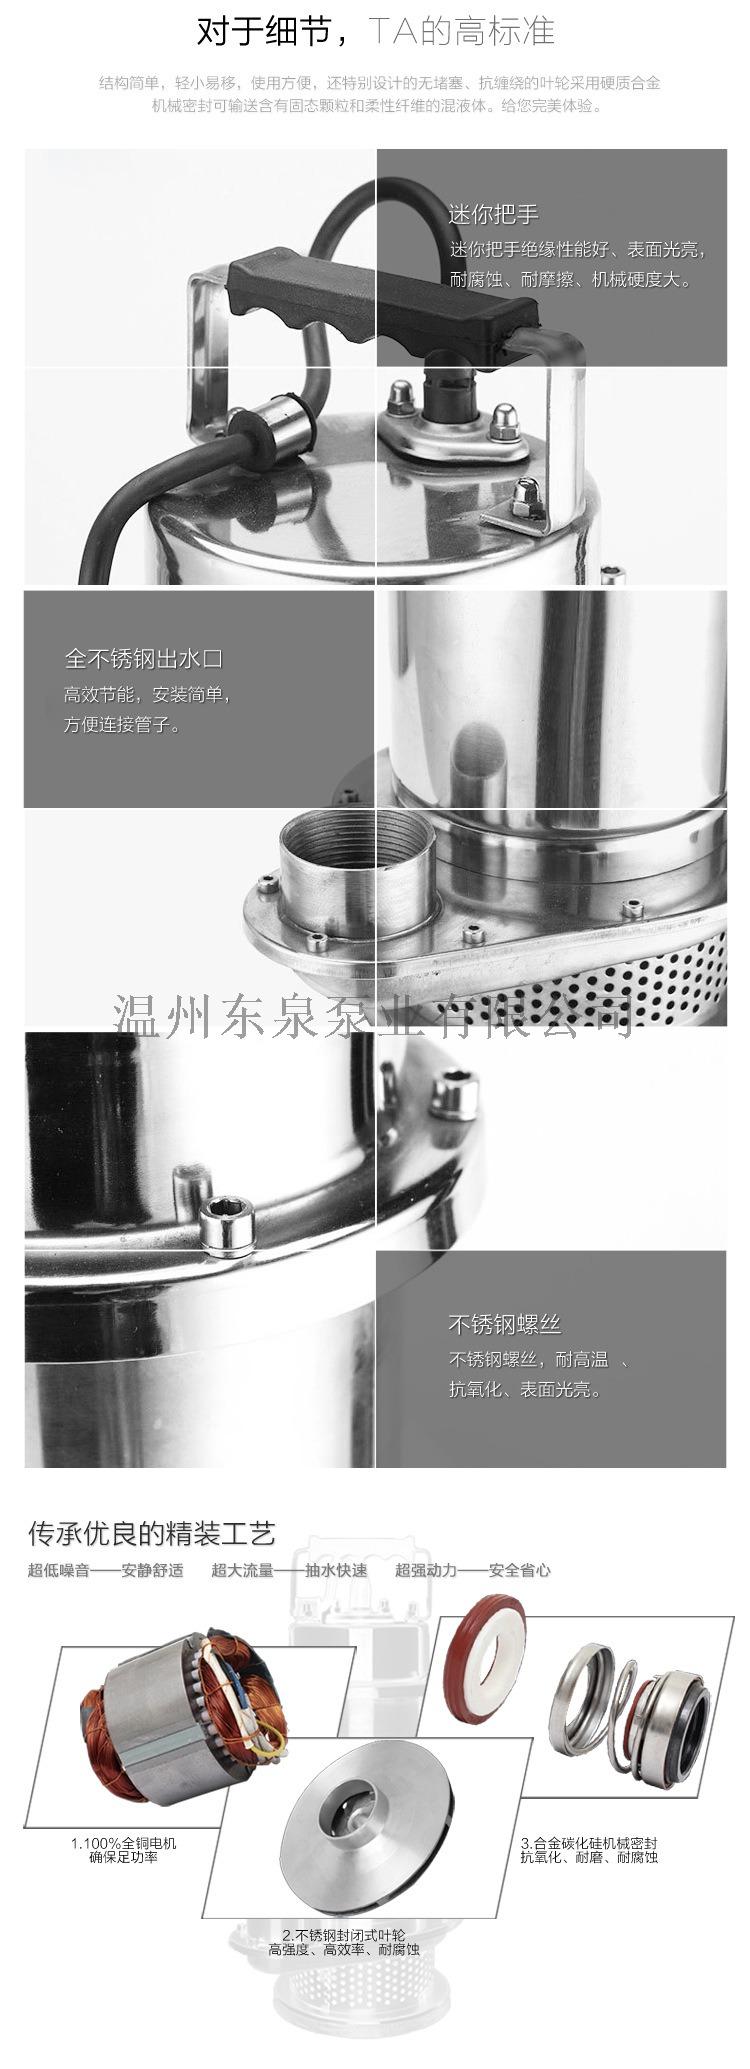 220V不锈钢、铸铁、铝合金QDX潜水泵67001645